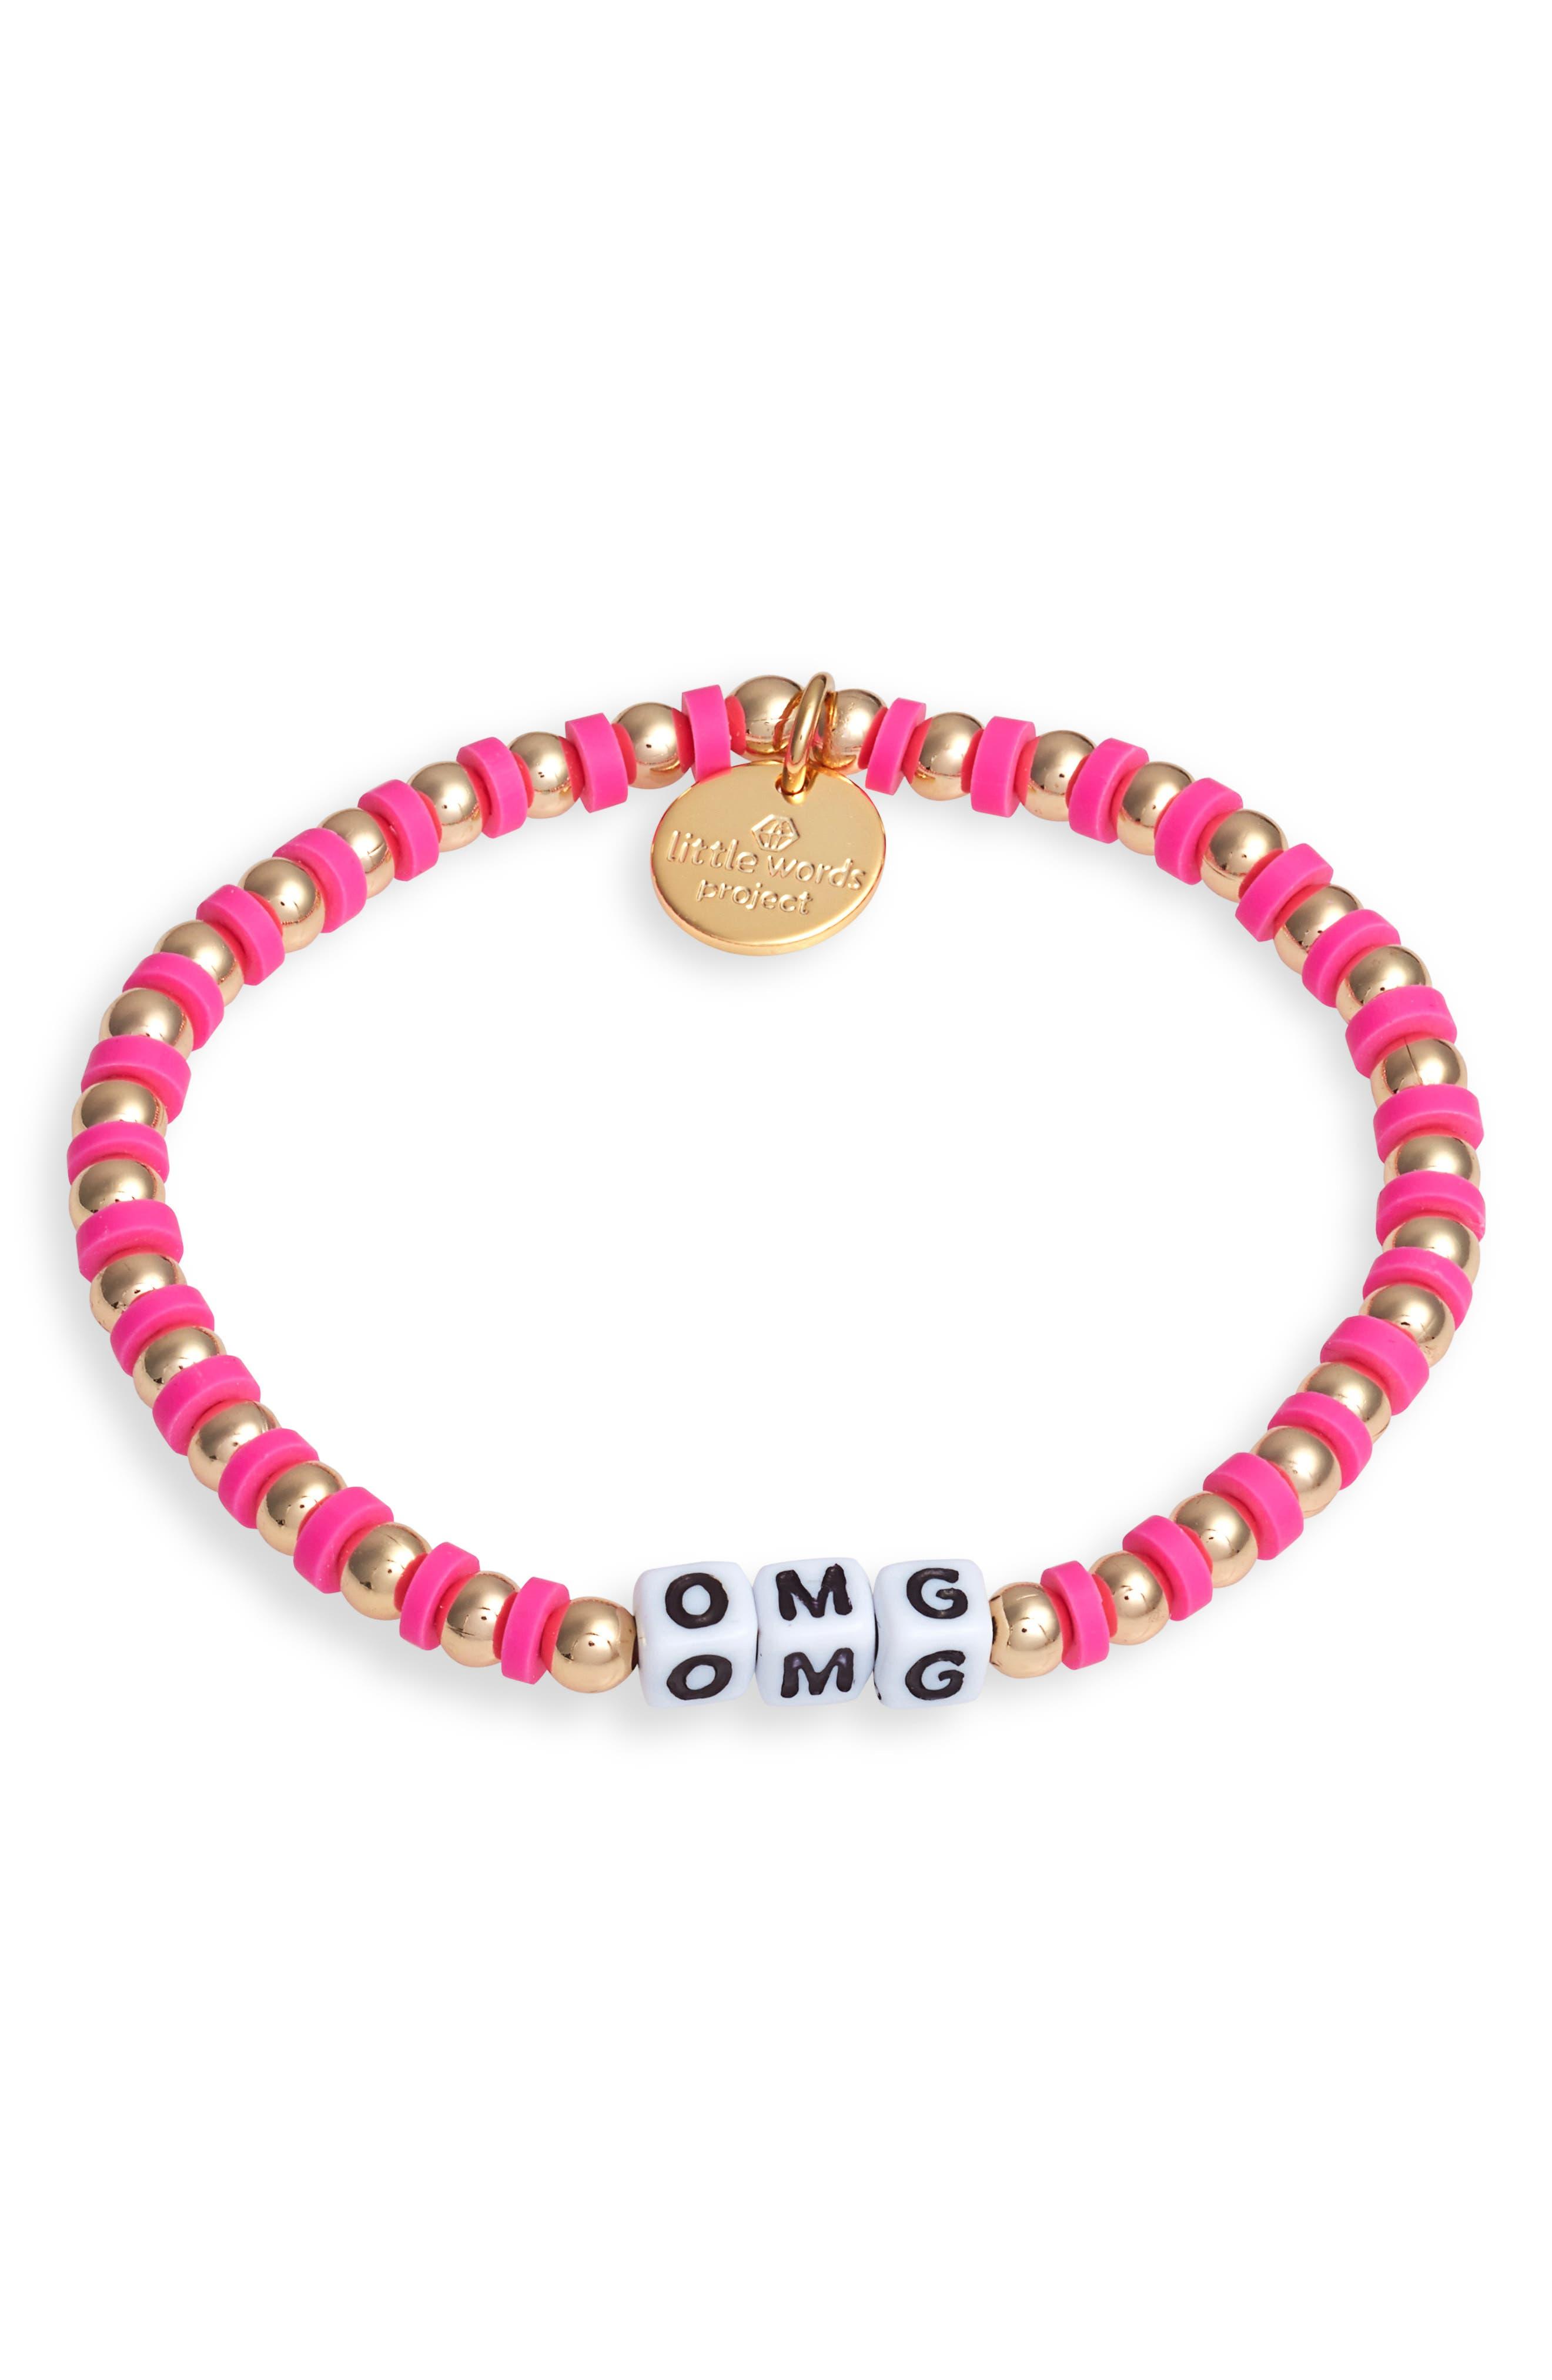 Omg Bracelet